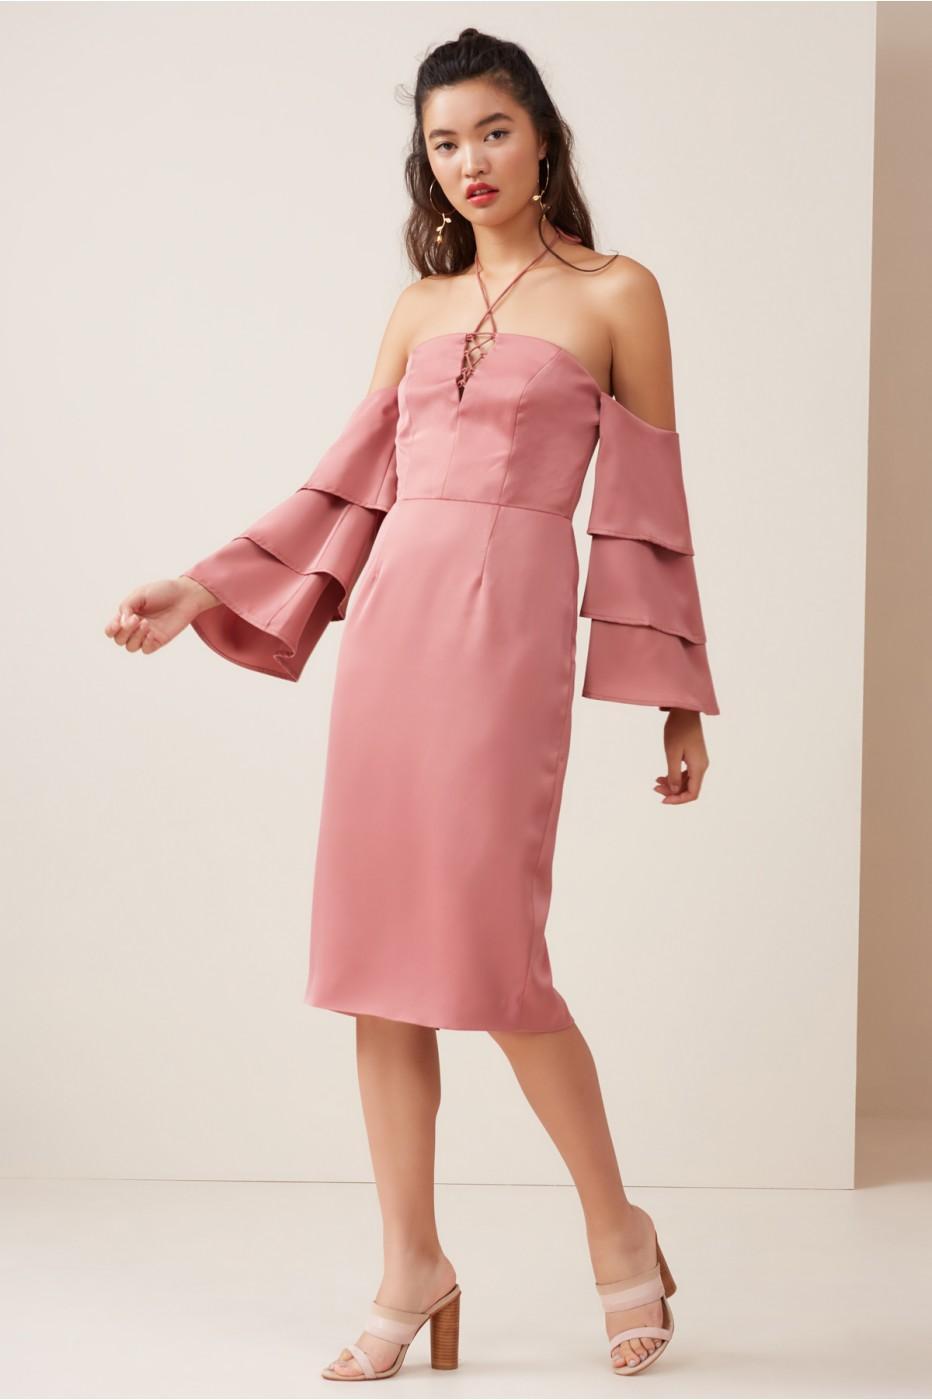 Finders Keepers Bloom Midi Dress In Dusty Sienna